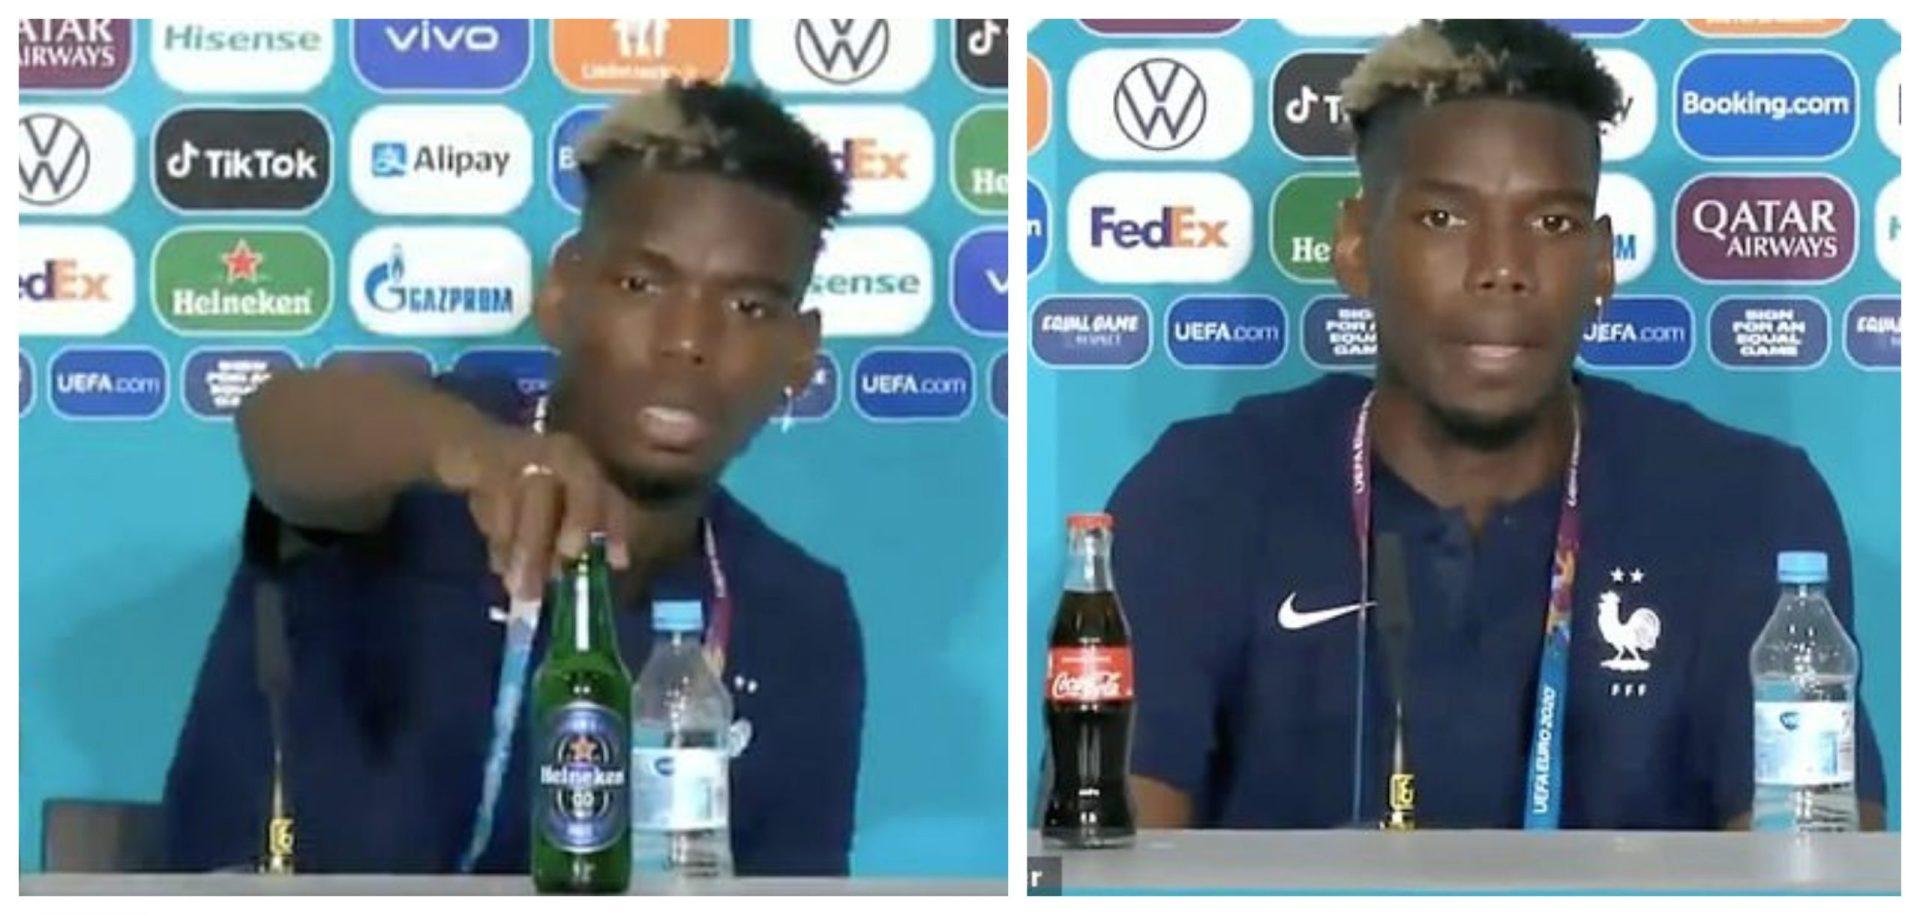 Paul Pogba mimics Ronaldo's press conference stunt; removes Heineken beer bottle away - THE SPORTS ROOM